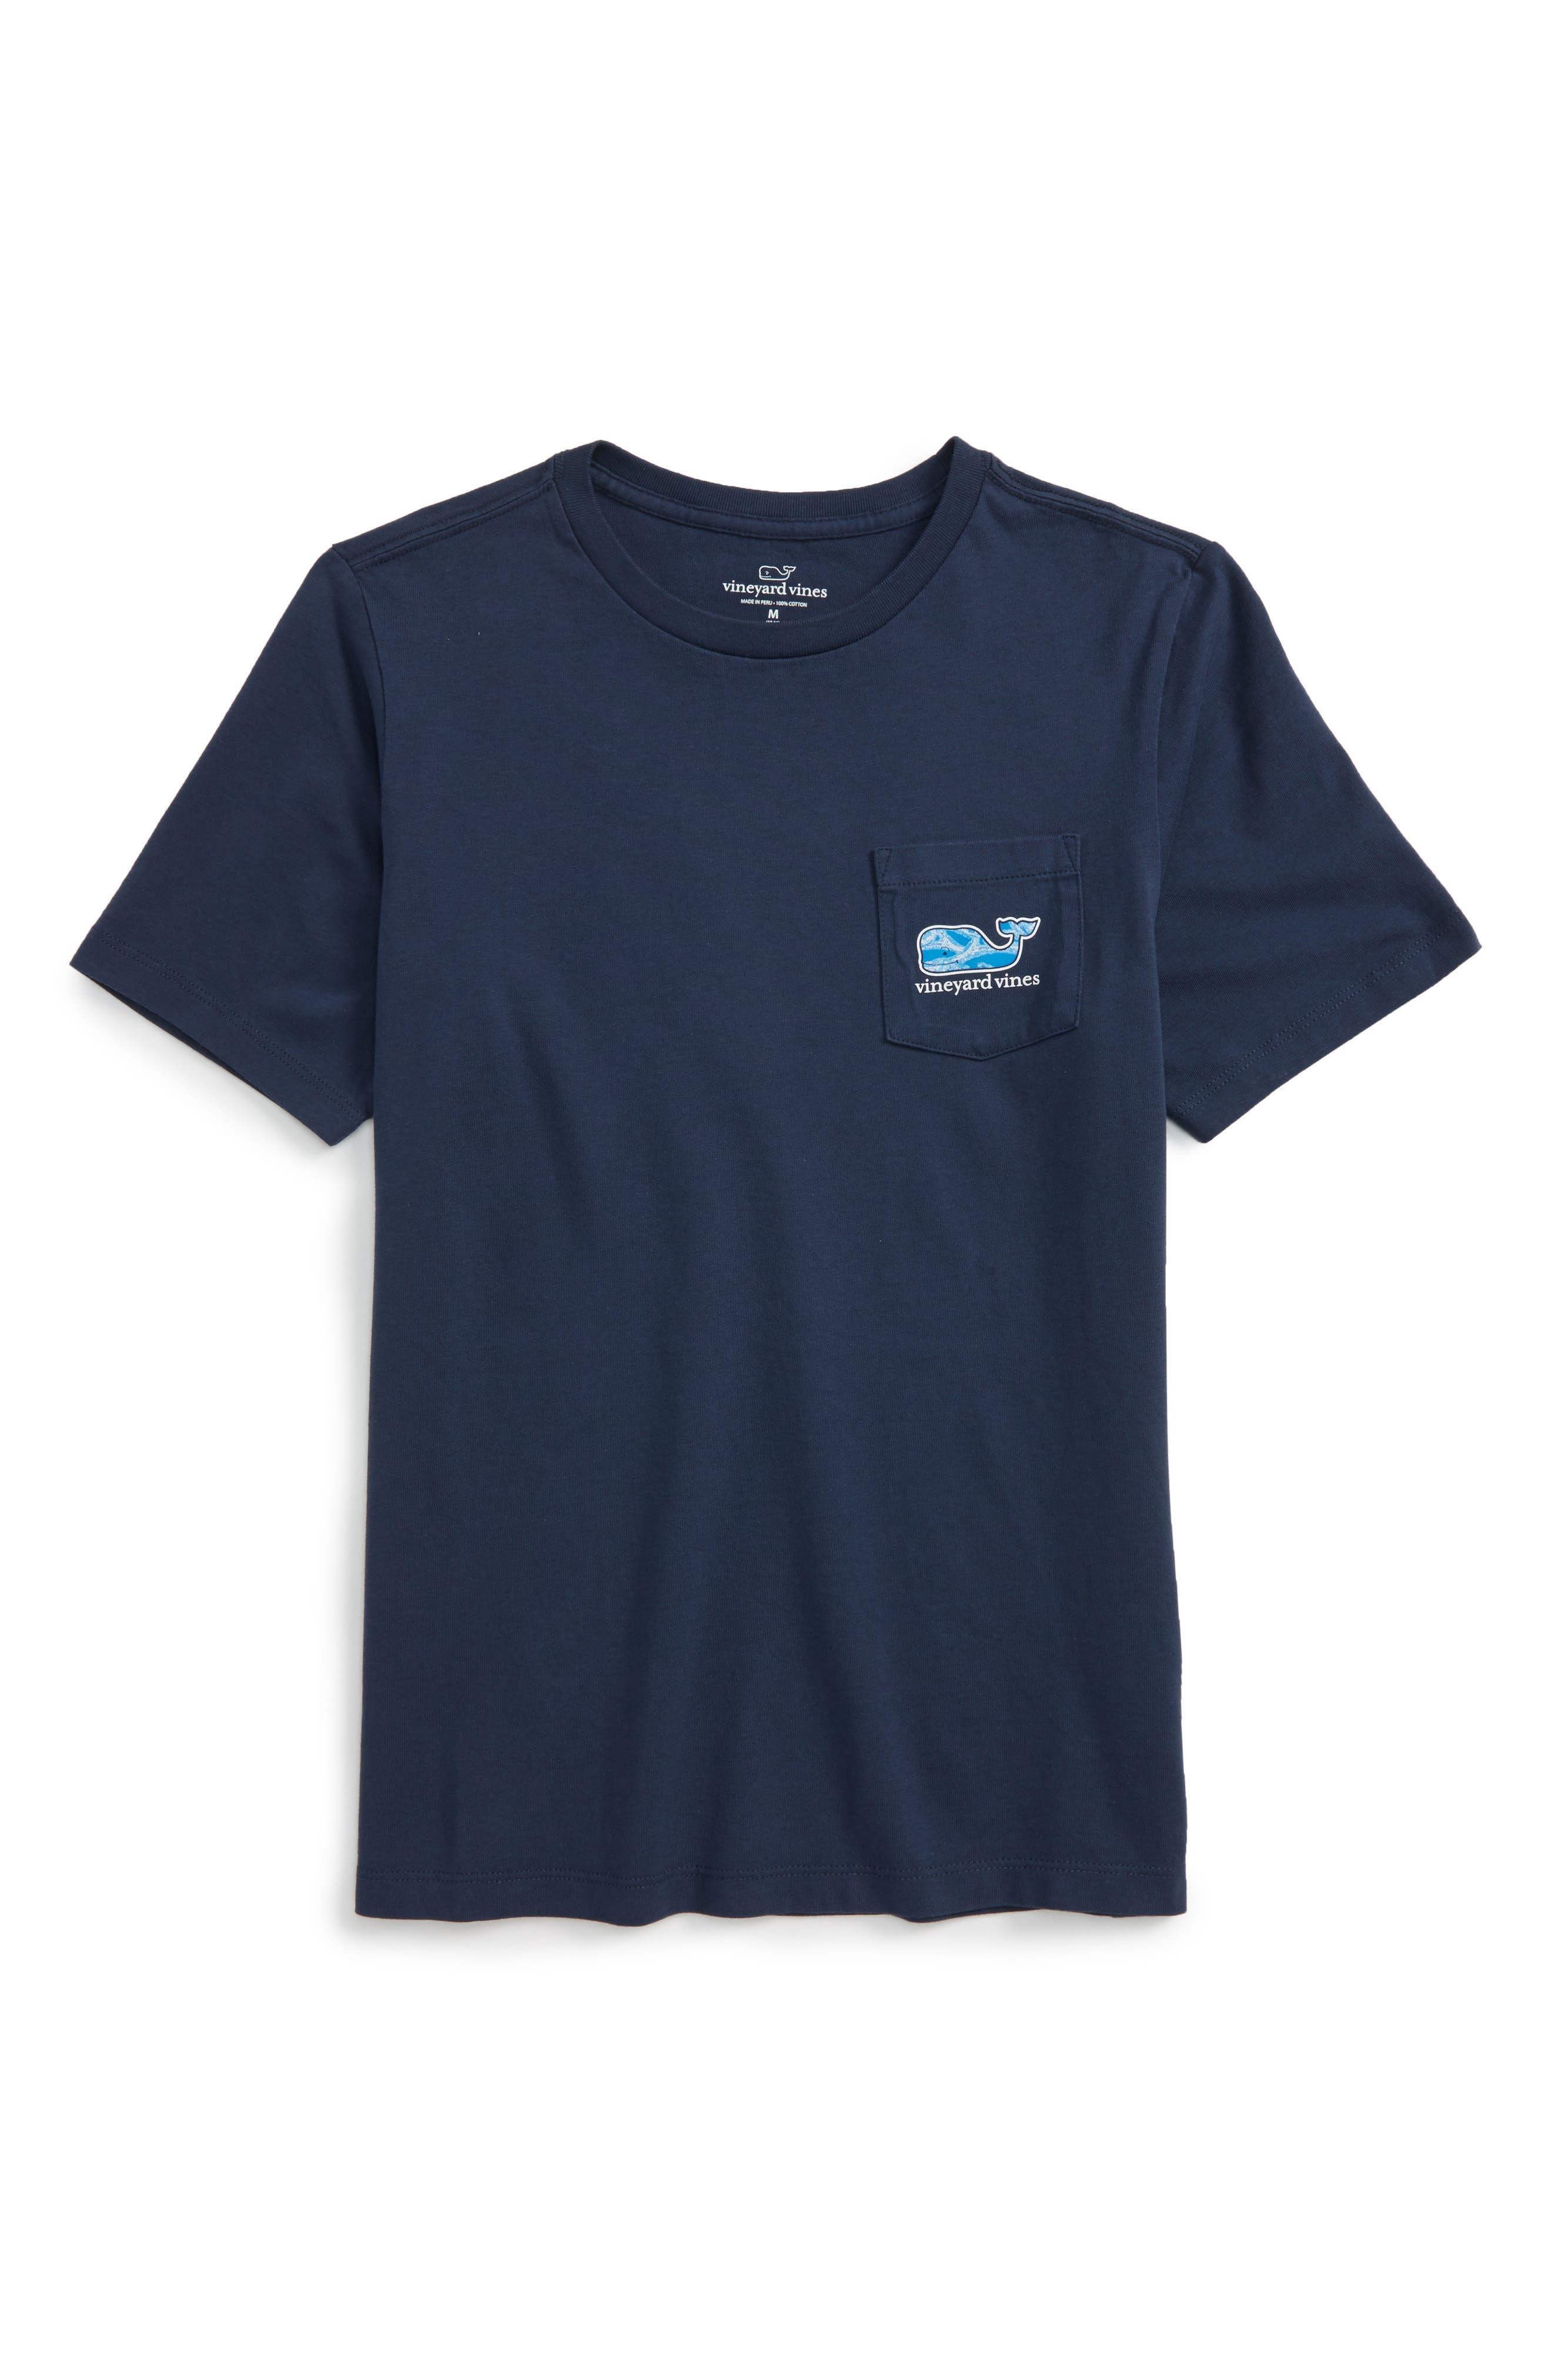 VINEYARD VINES Marlin Whale Pocket T-Shirt